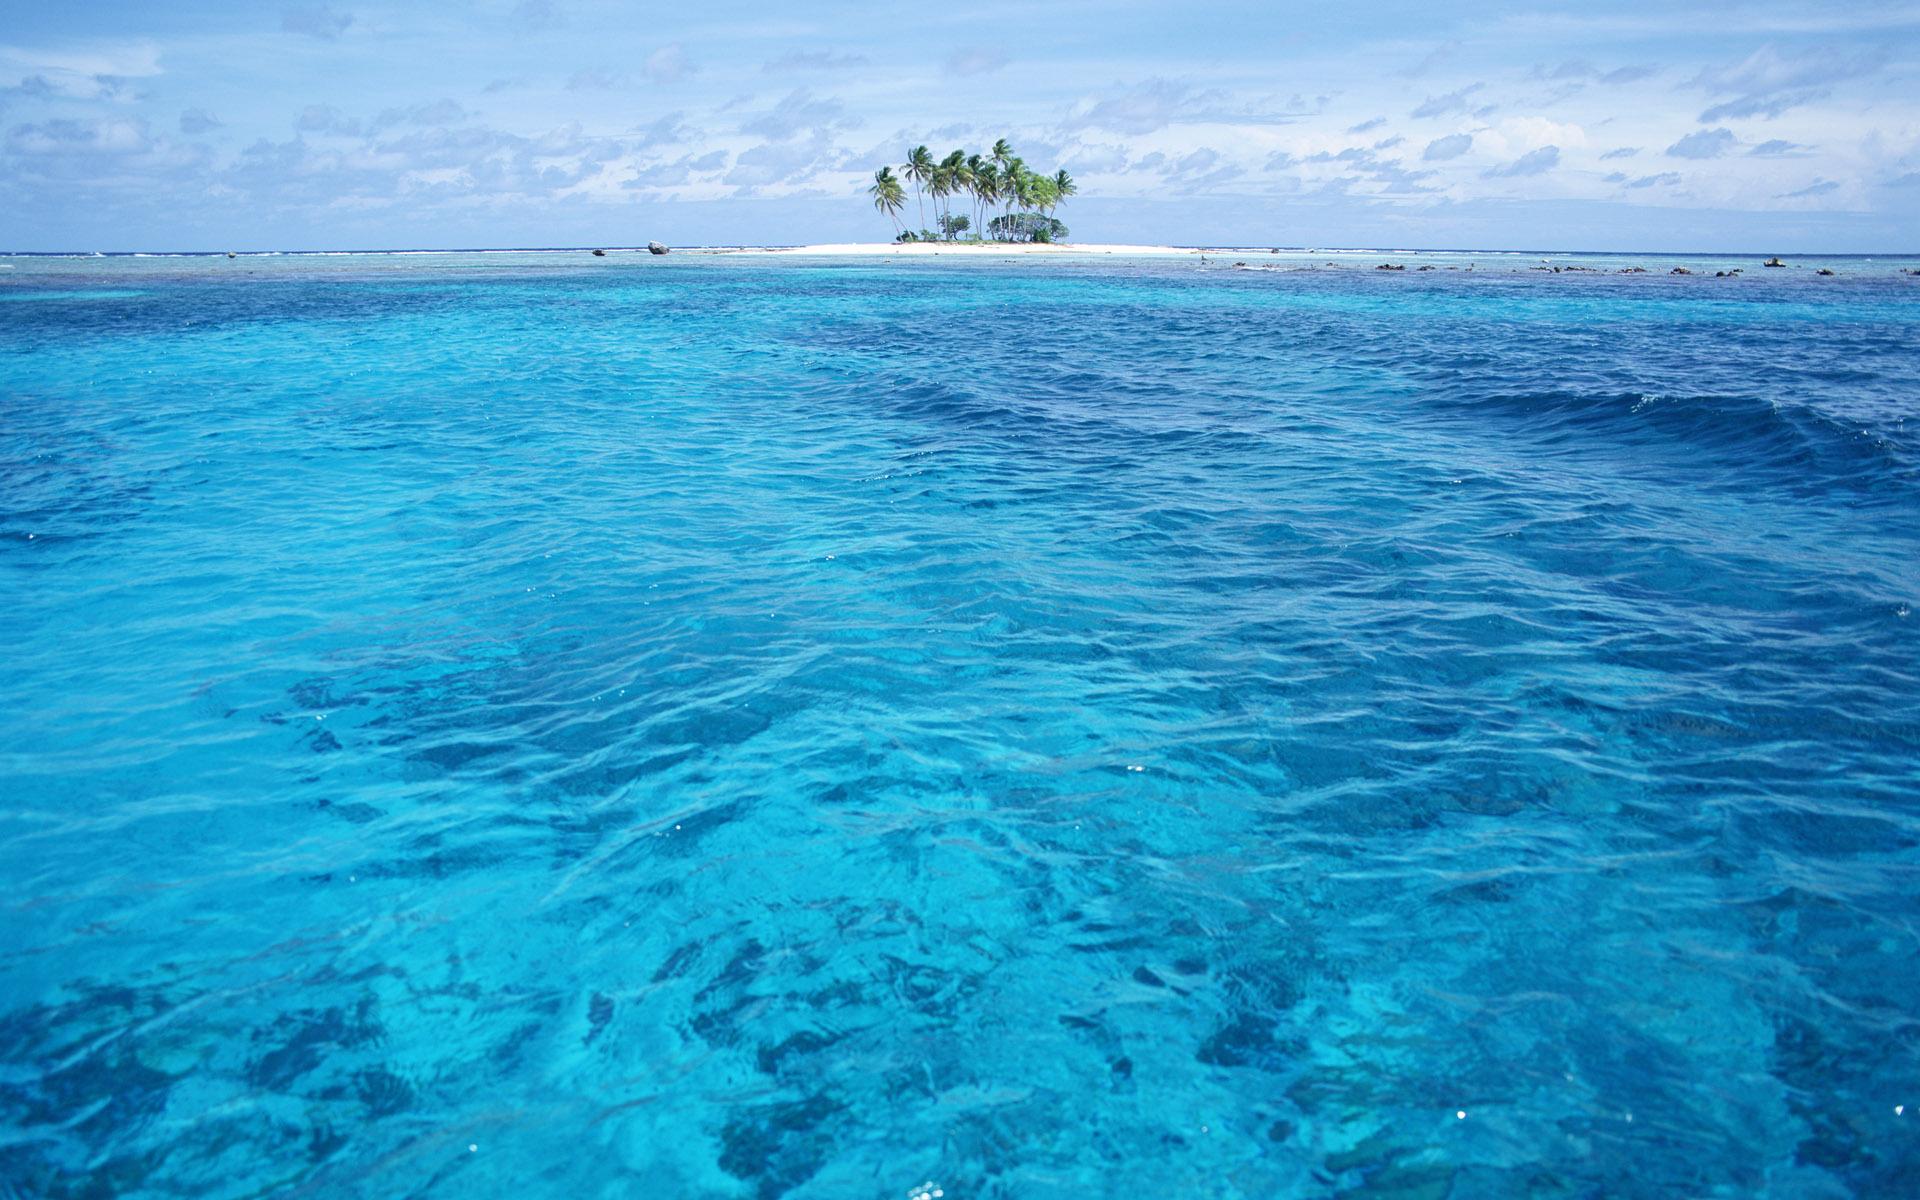 вода море природа  № 398860 загрузить